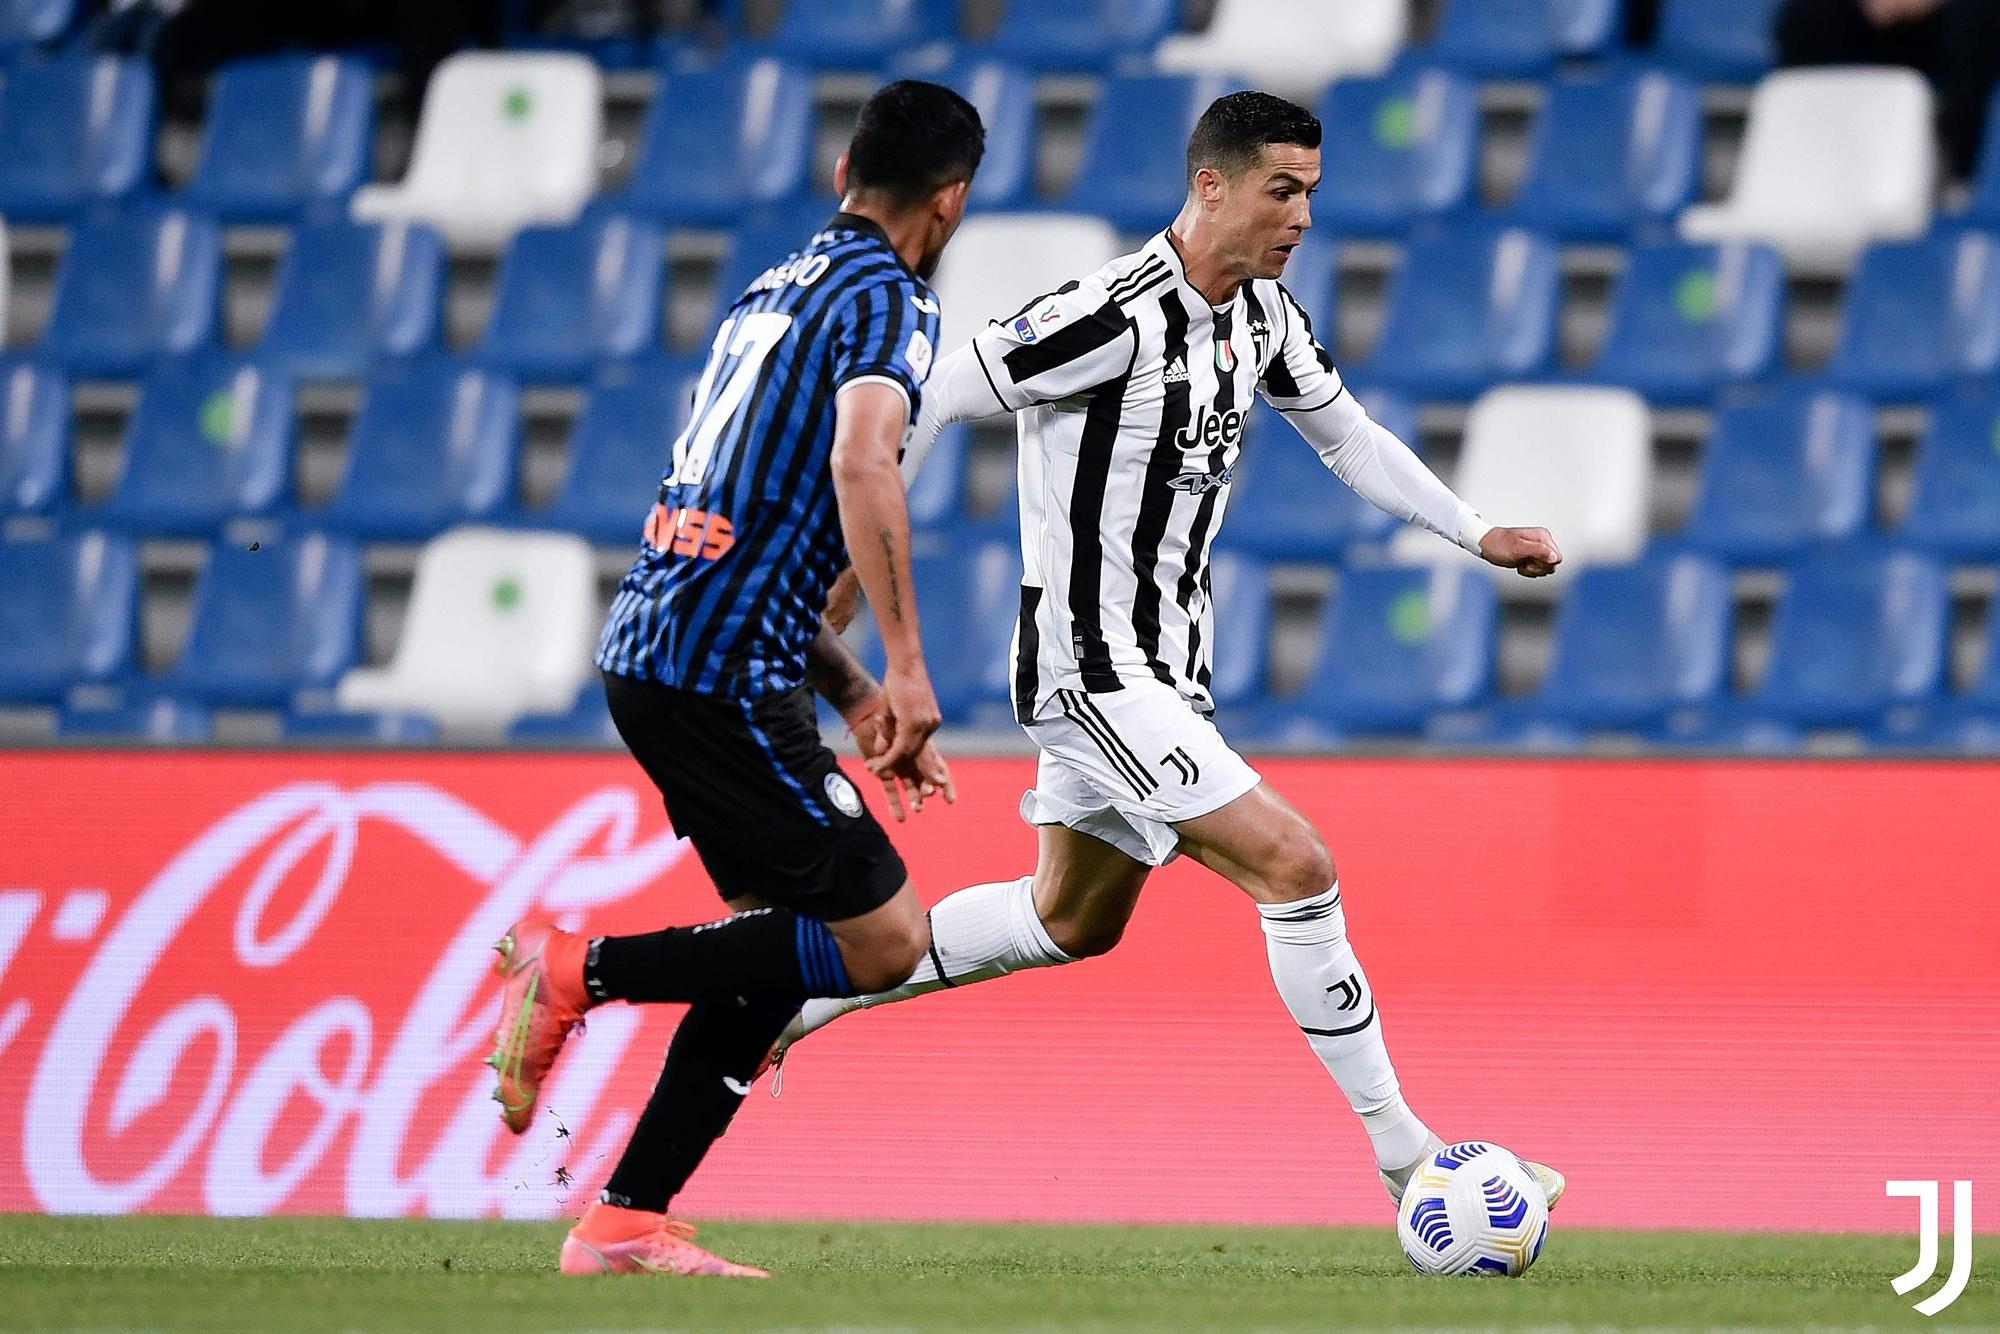 Ronaldo menendang penuh 90 menit, tapi gagal.  Dia gagal mencetak gol dalam tiga pertandingan melawan Atalanta di semua kompetisi musim ini.  Di leg pertama Serie A, Ronaldo gagal mengeksekusi penalti dengan hasil imbang 1-1.  Di leg kedua, dia terdiam dan Juventus kalah 0-1 di Atalanta.  Foto: Twitter / Juventus